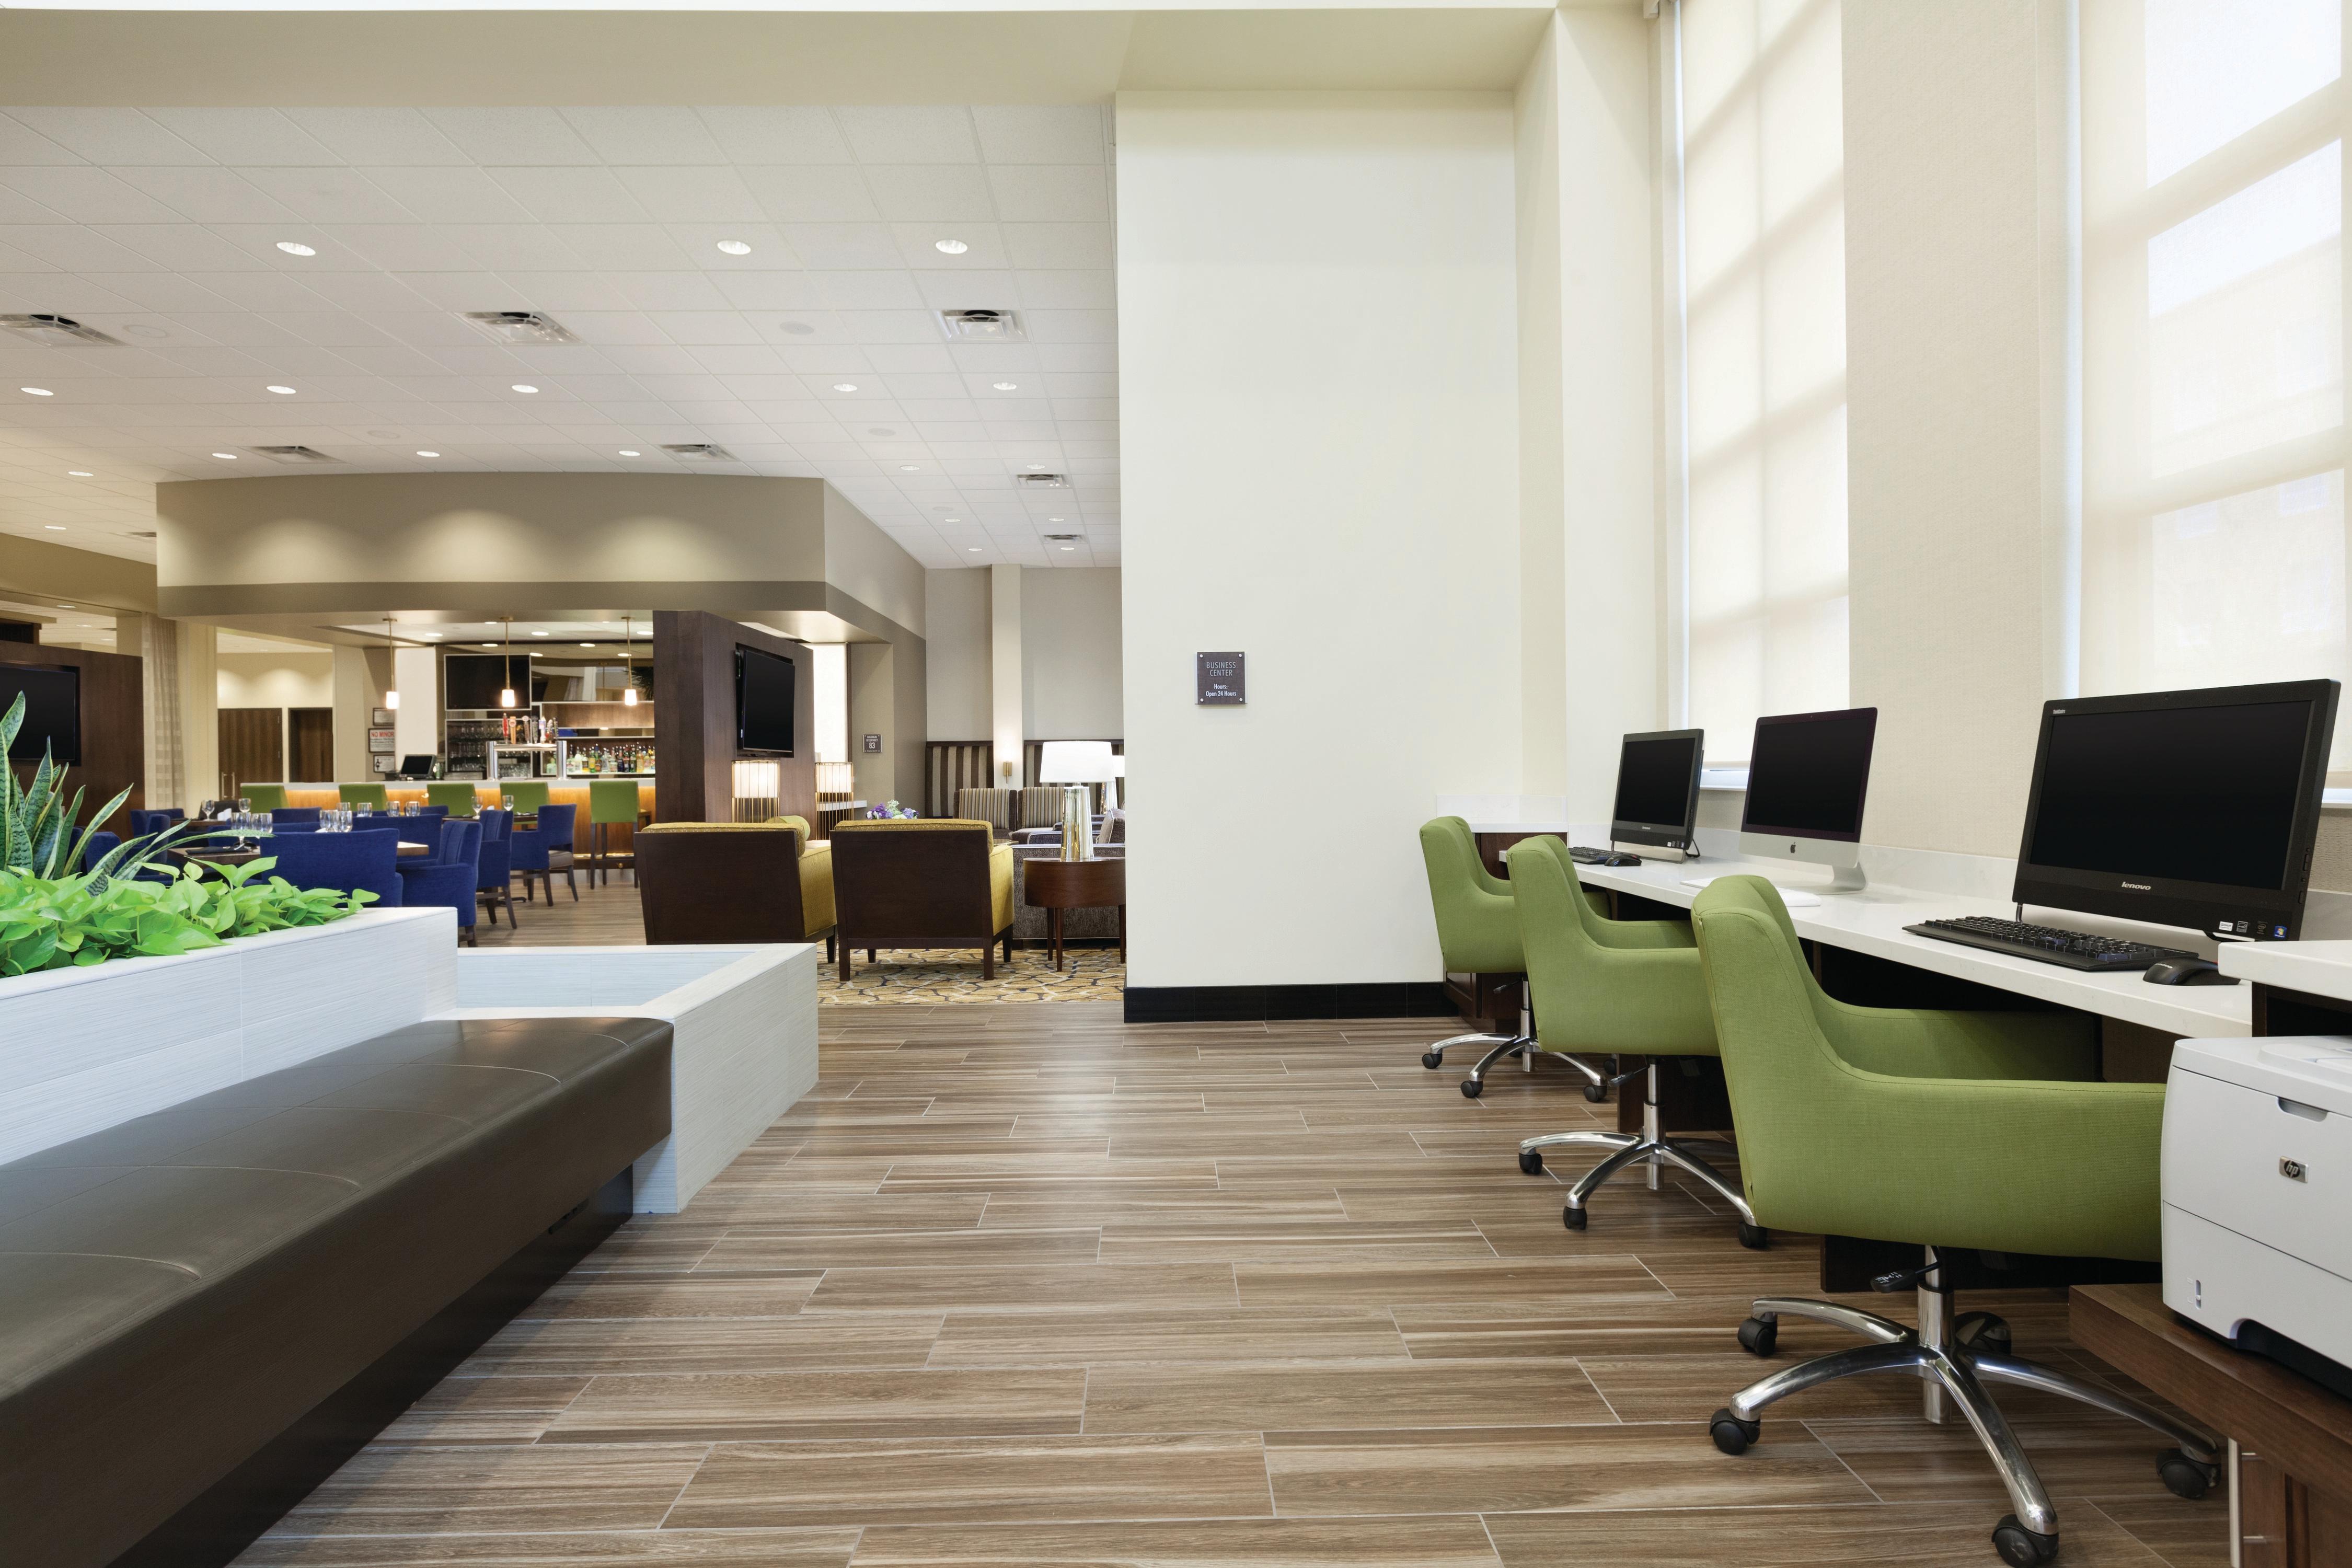 Embassy Suites by Hilton Portland Hillsboro, Oregon image 9